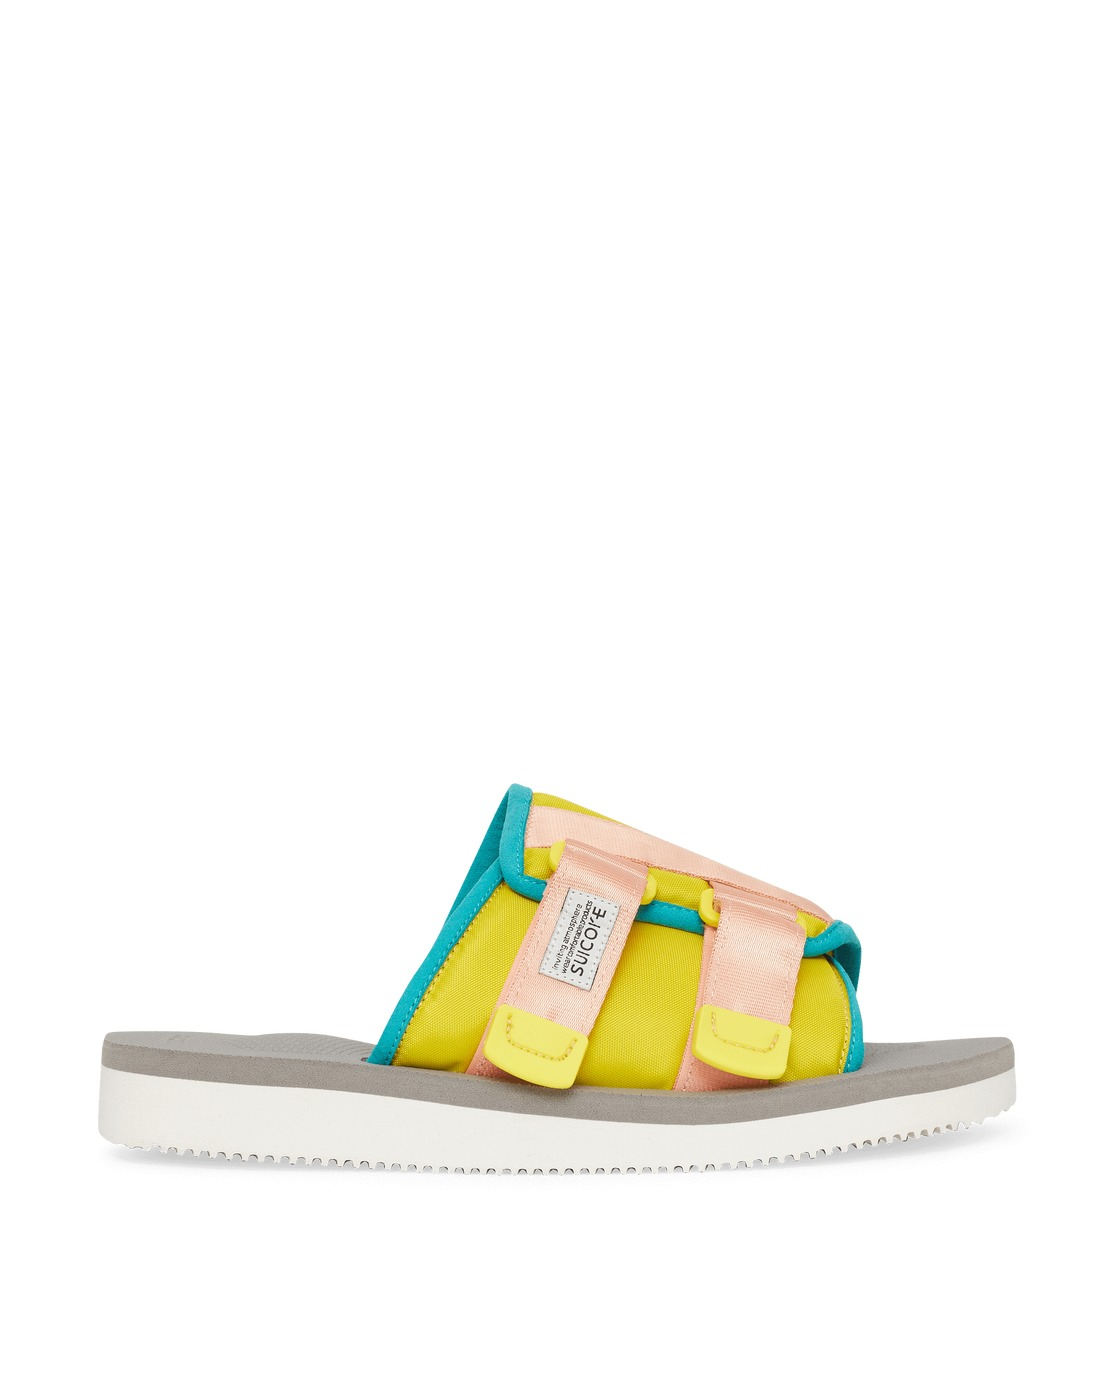 Photo: Suicoke Kaw Cab Sandals Yellow/Gray